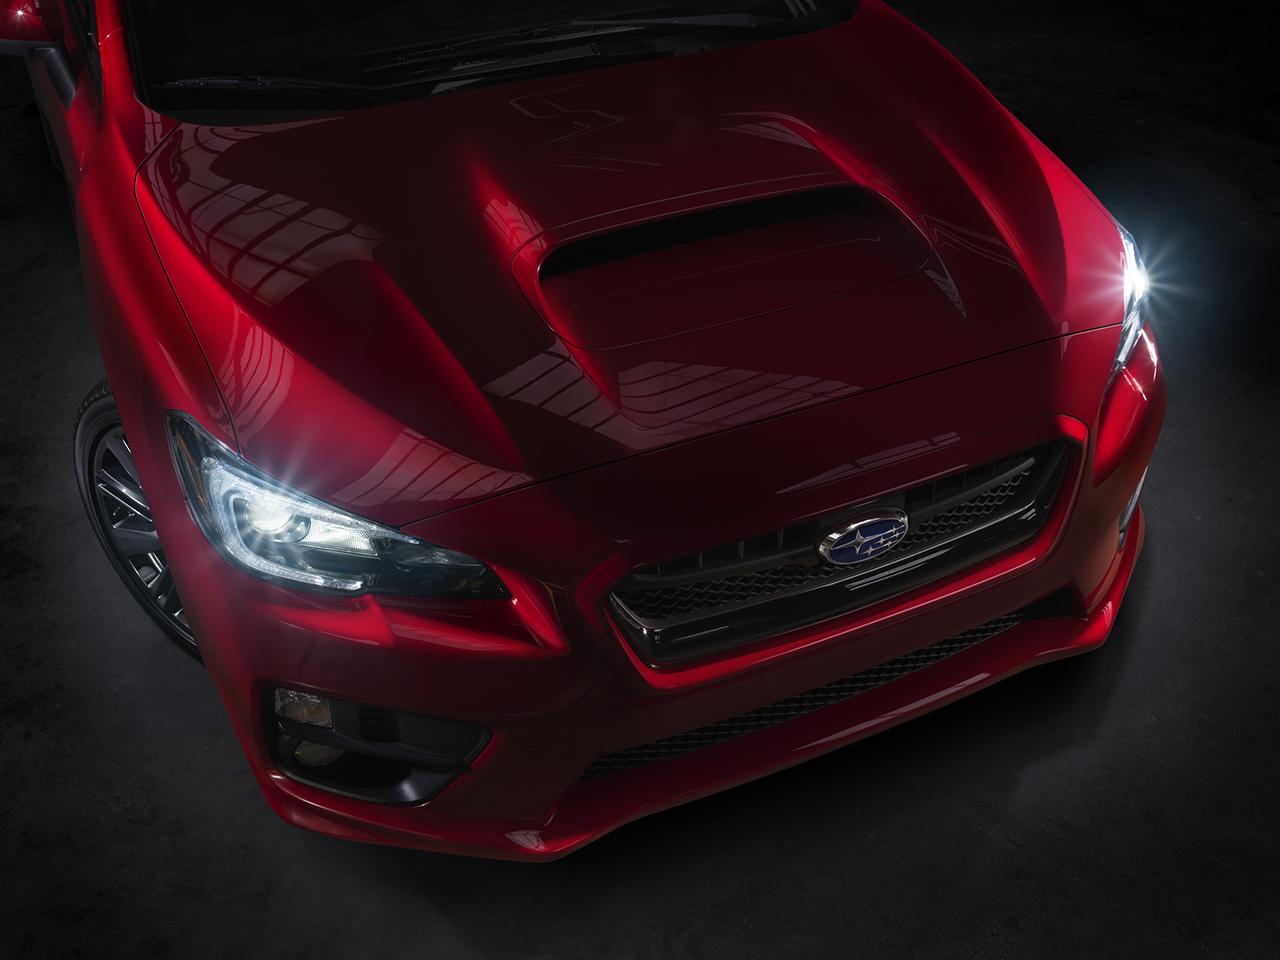 2014 Subaru WRX Teaser